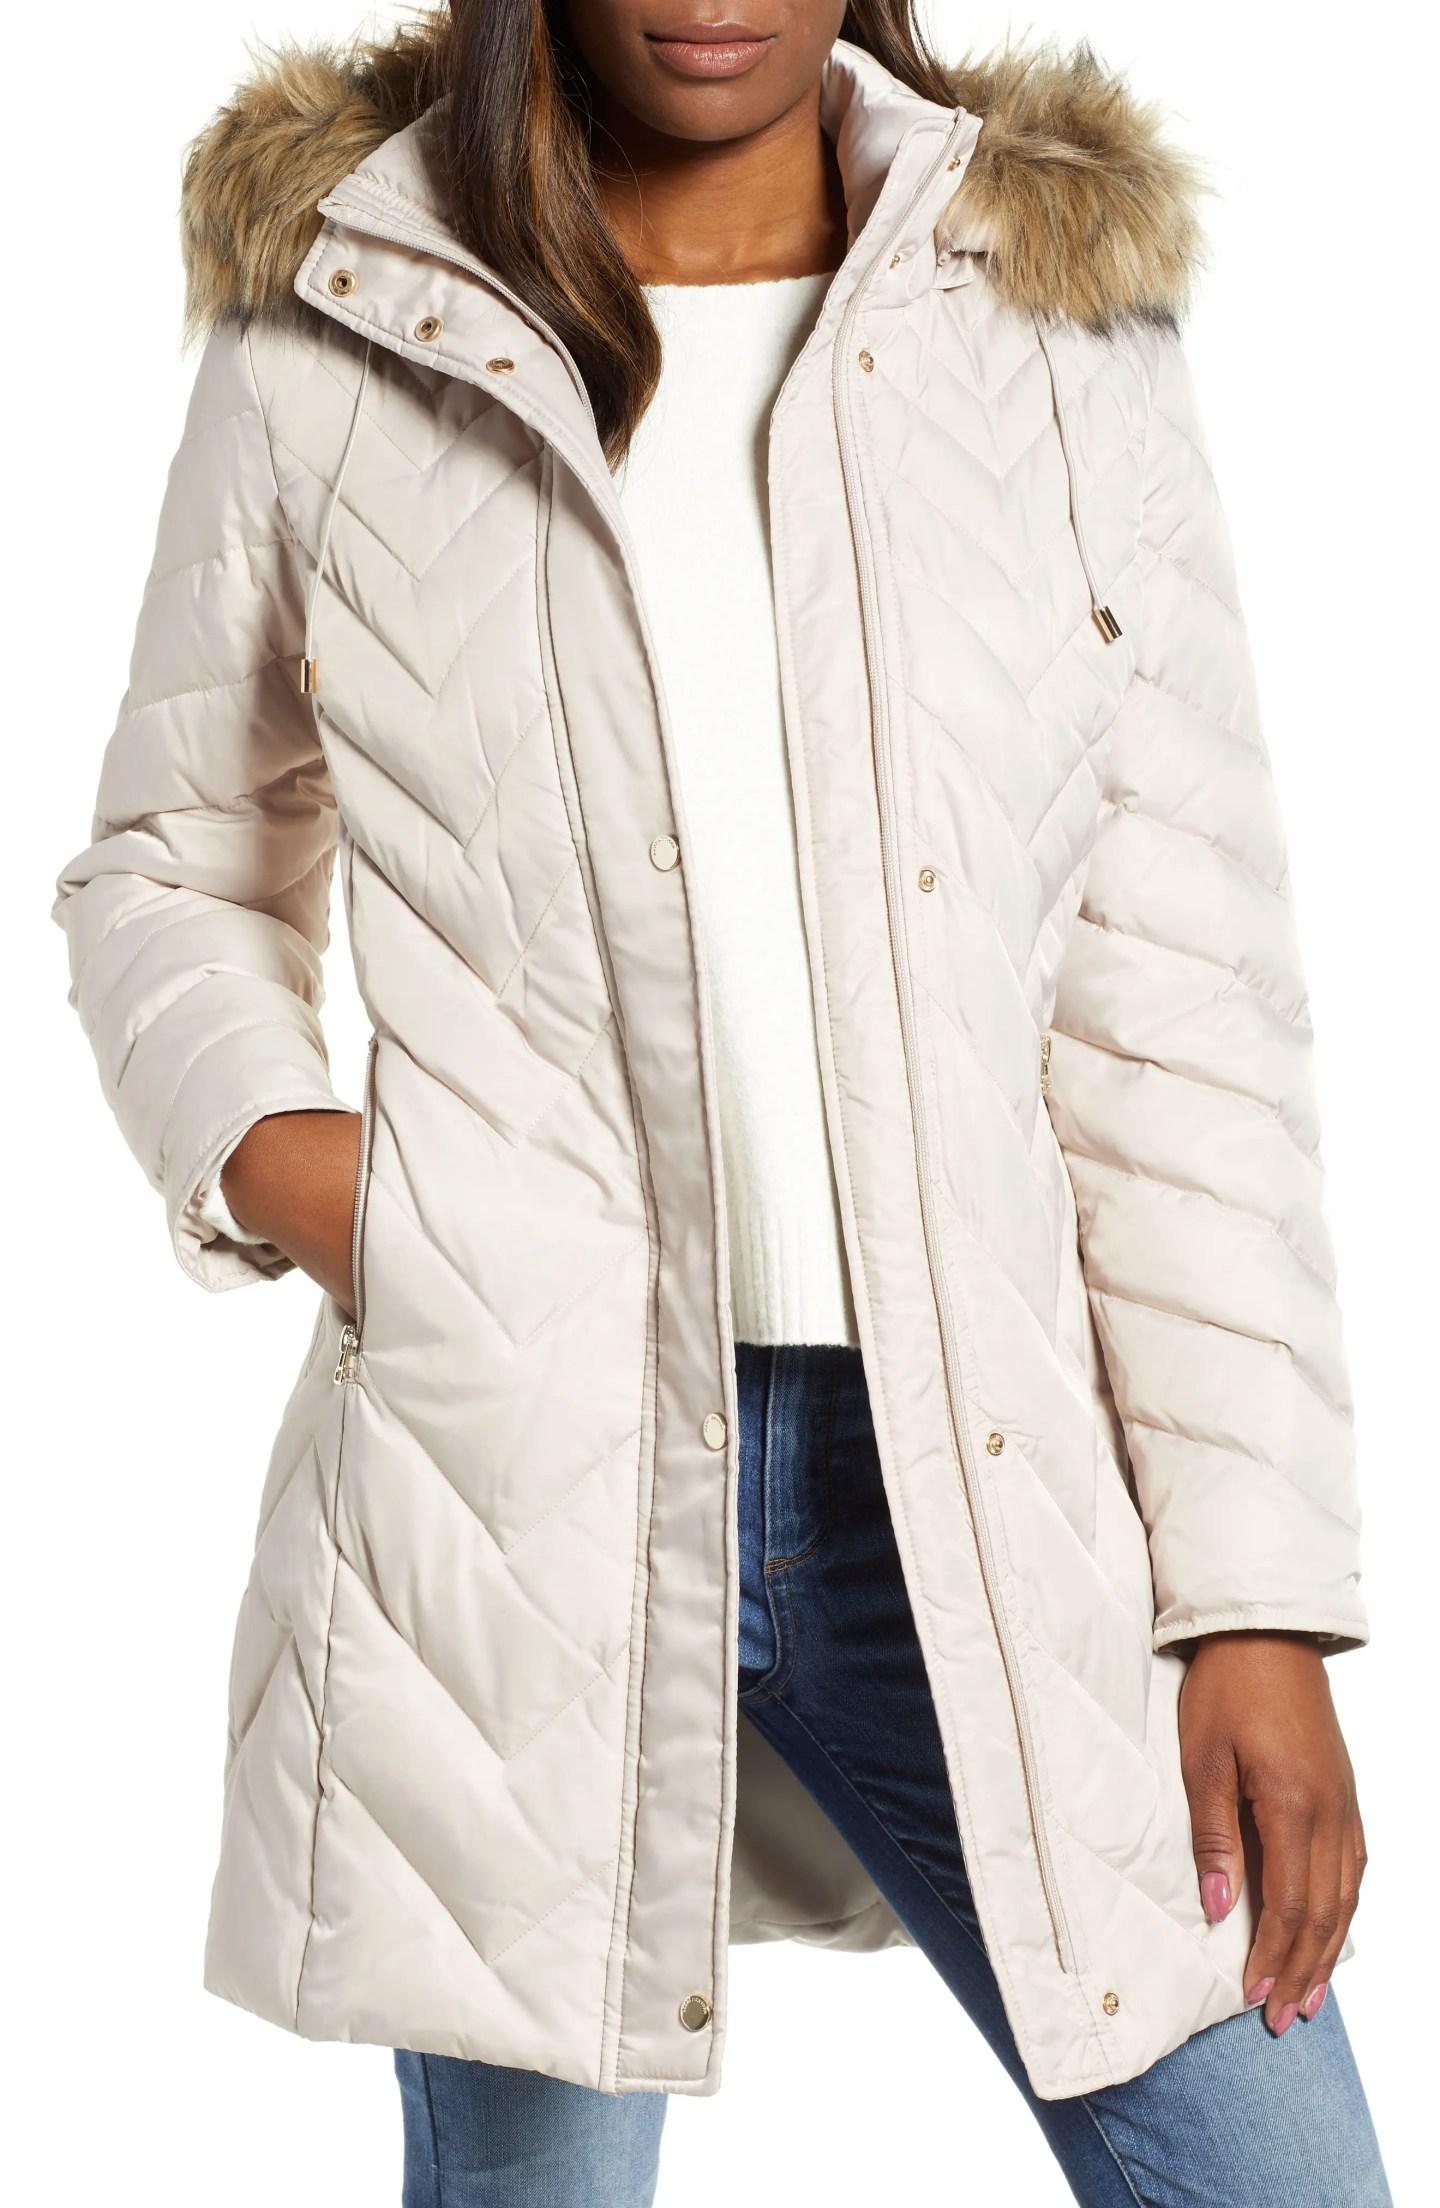 Satin Fur Trimmed Coat